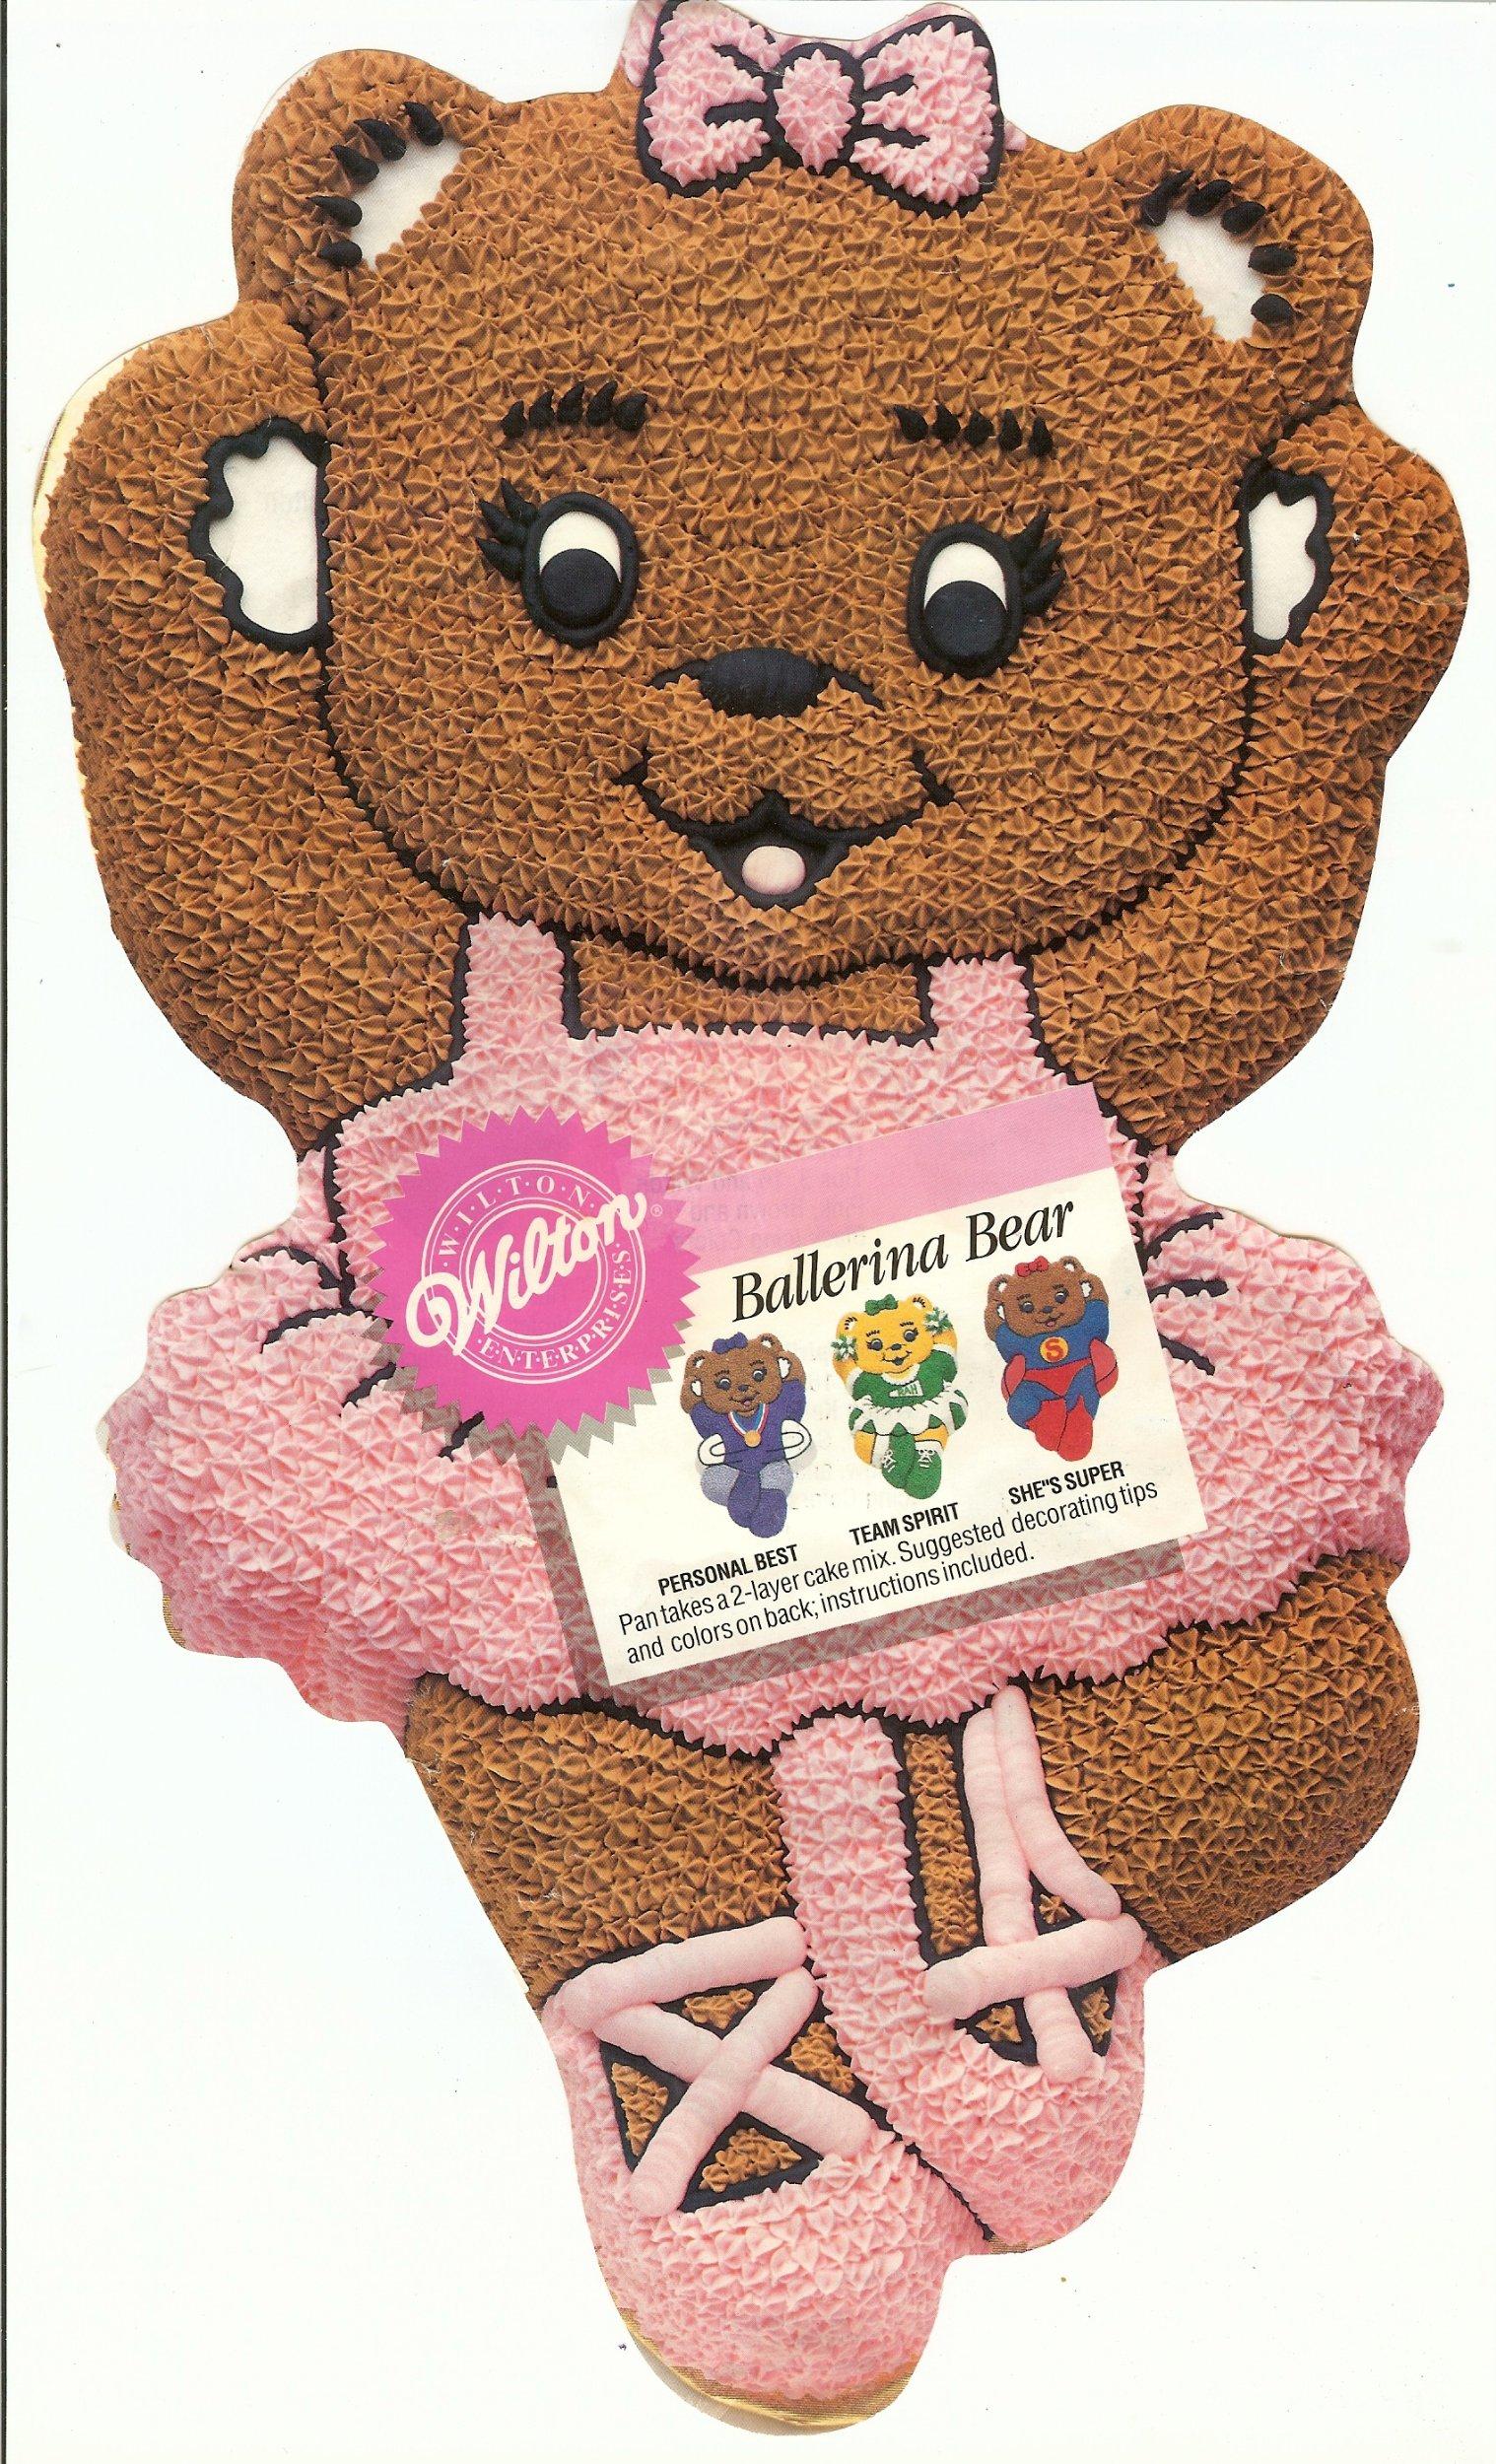 Wilton Ballerina Ballet Cheerleader Gymnastics Super Bear Cake Pan (2105-2021, 1992)